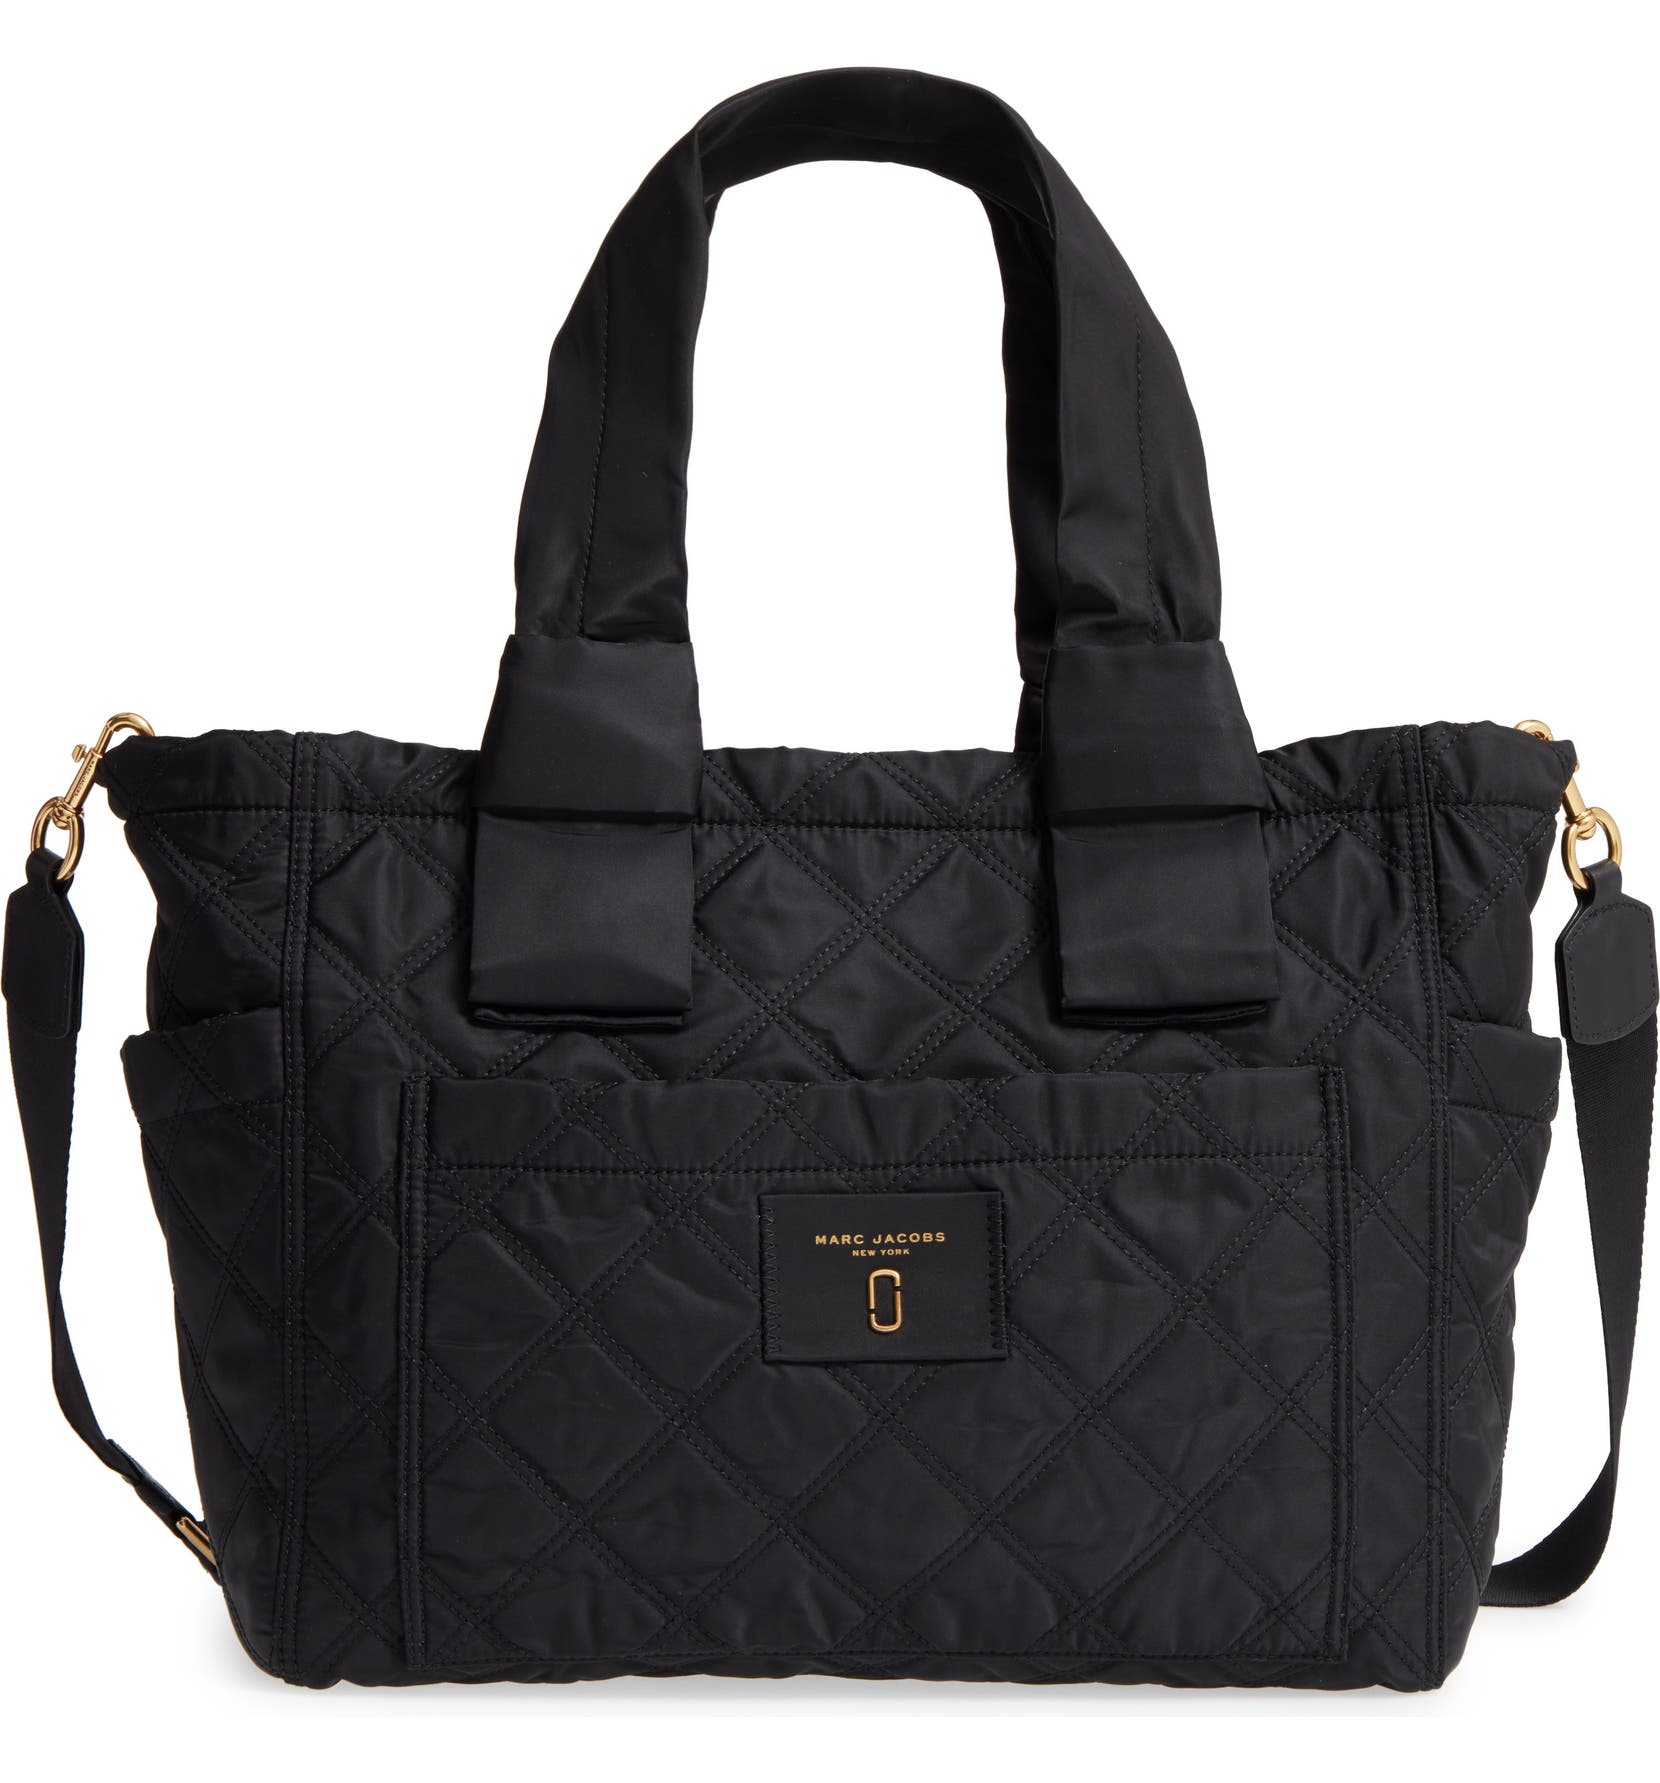 1a45dc6b8a4e MARC JACOBS Nylon Knot Diaper Bag